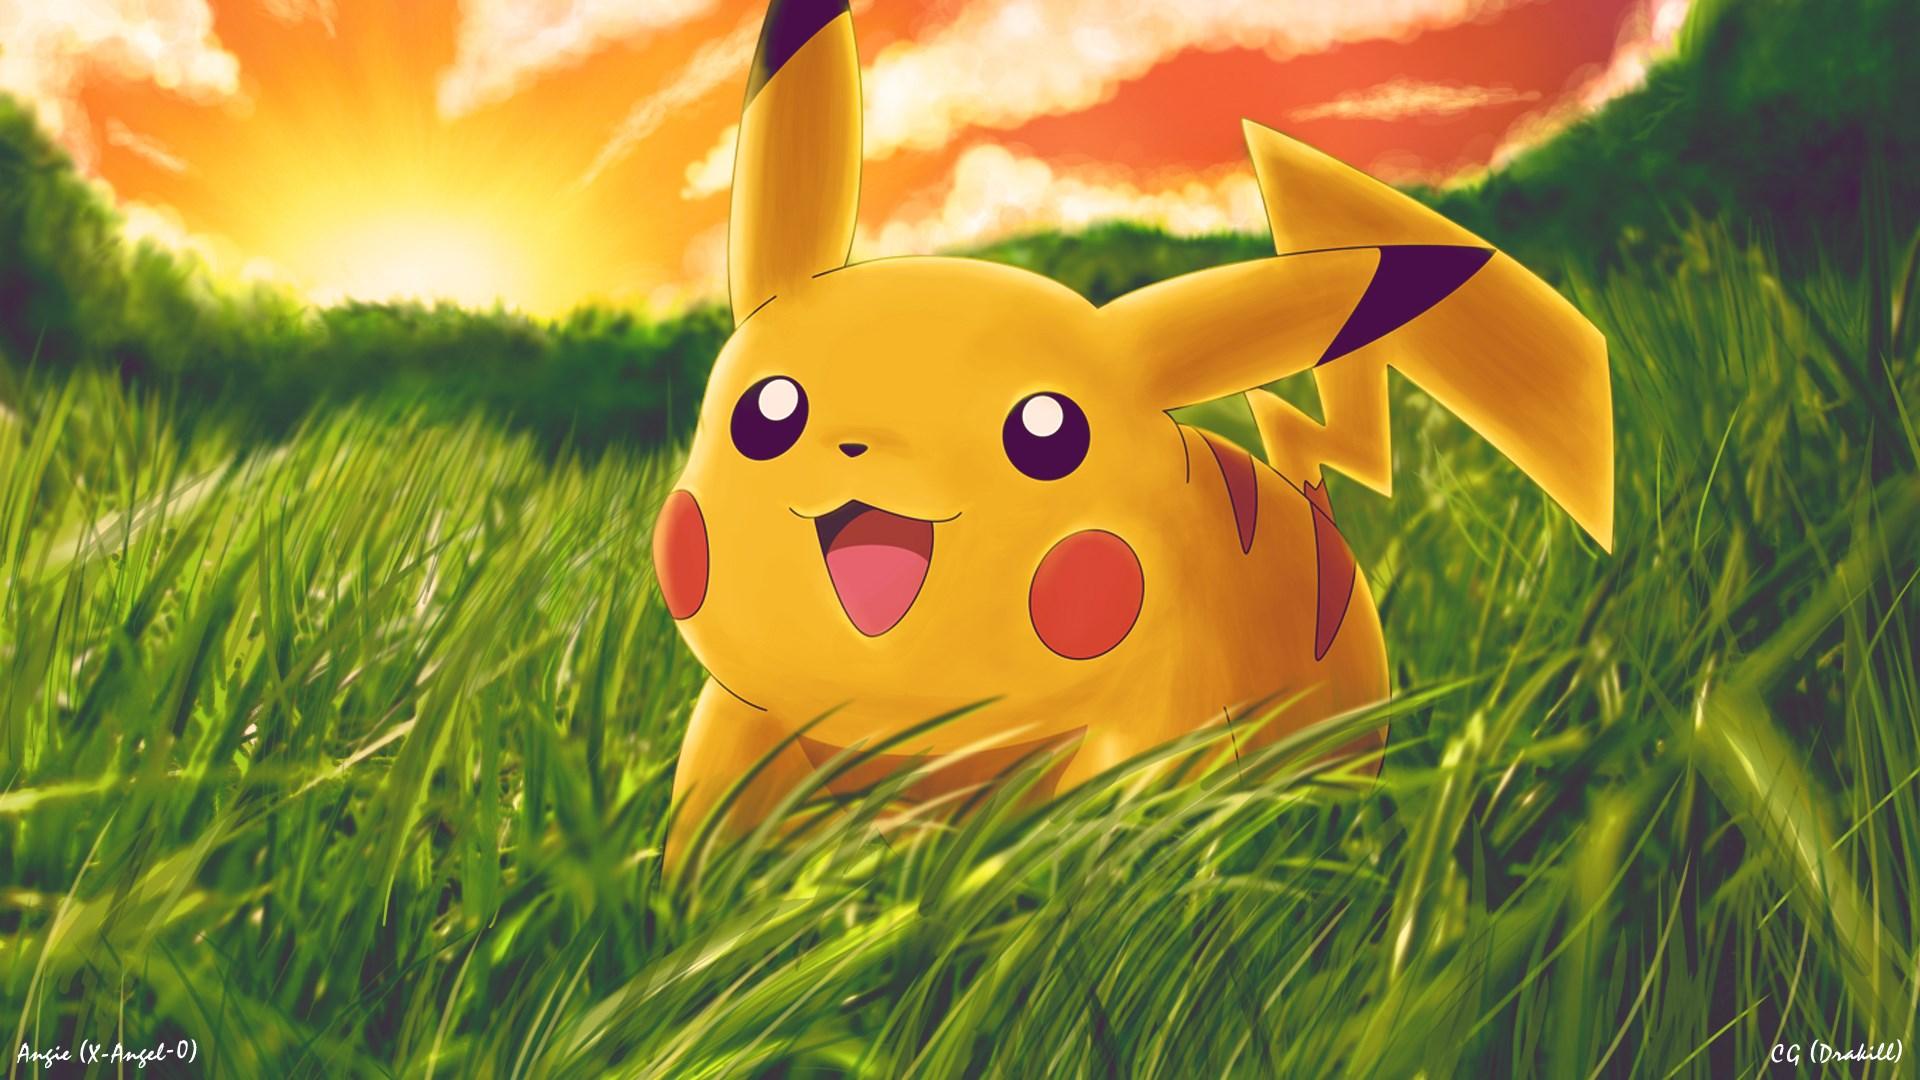 Pikachu Pokemon Cartoon Hd Wallpaper Wallpaper List 1920x1080